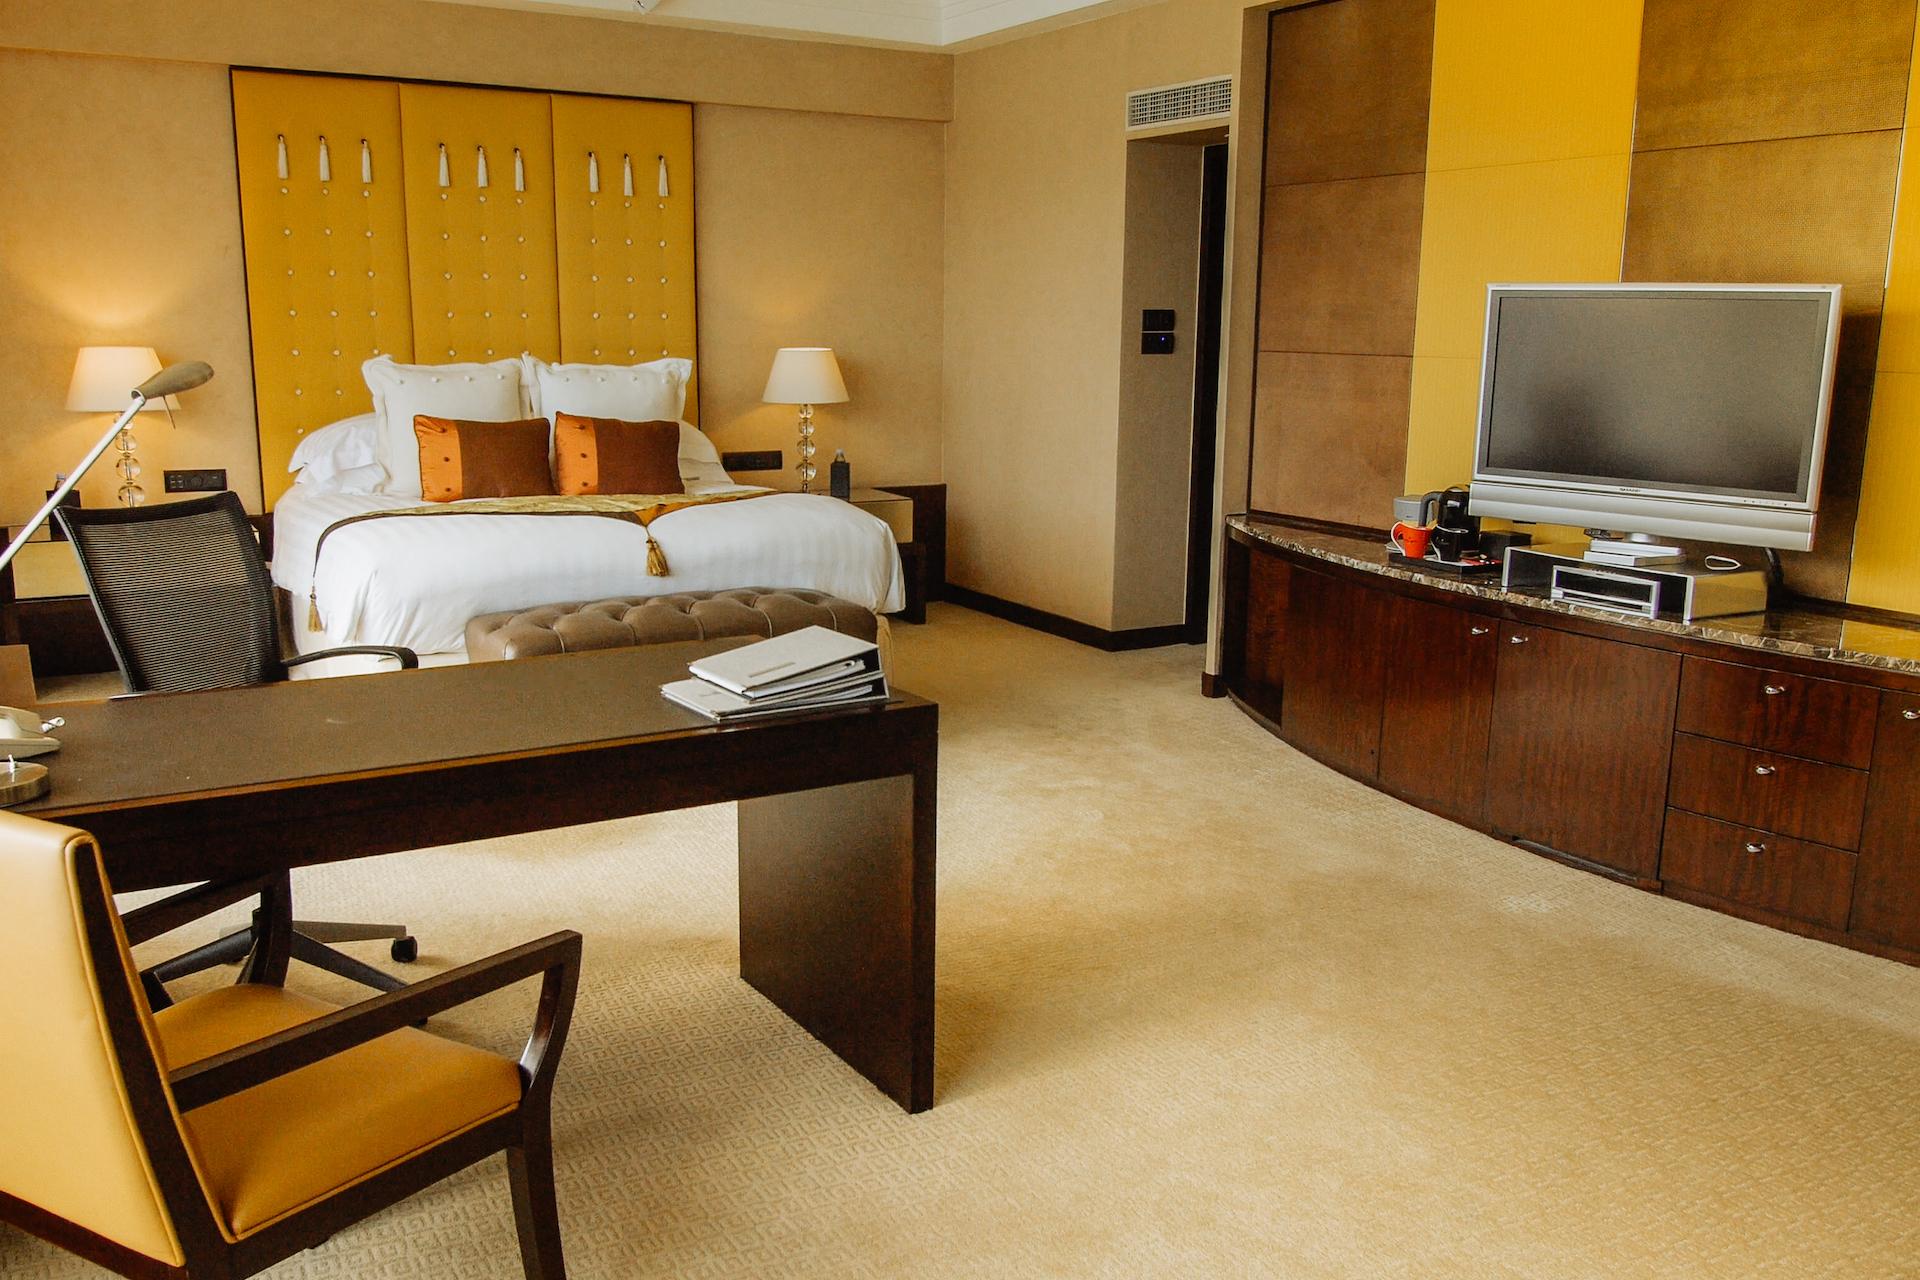 InterContinental Room Lounge Area